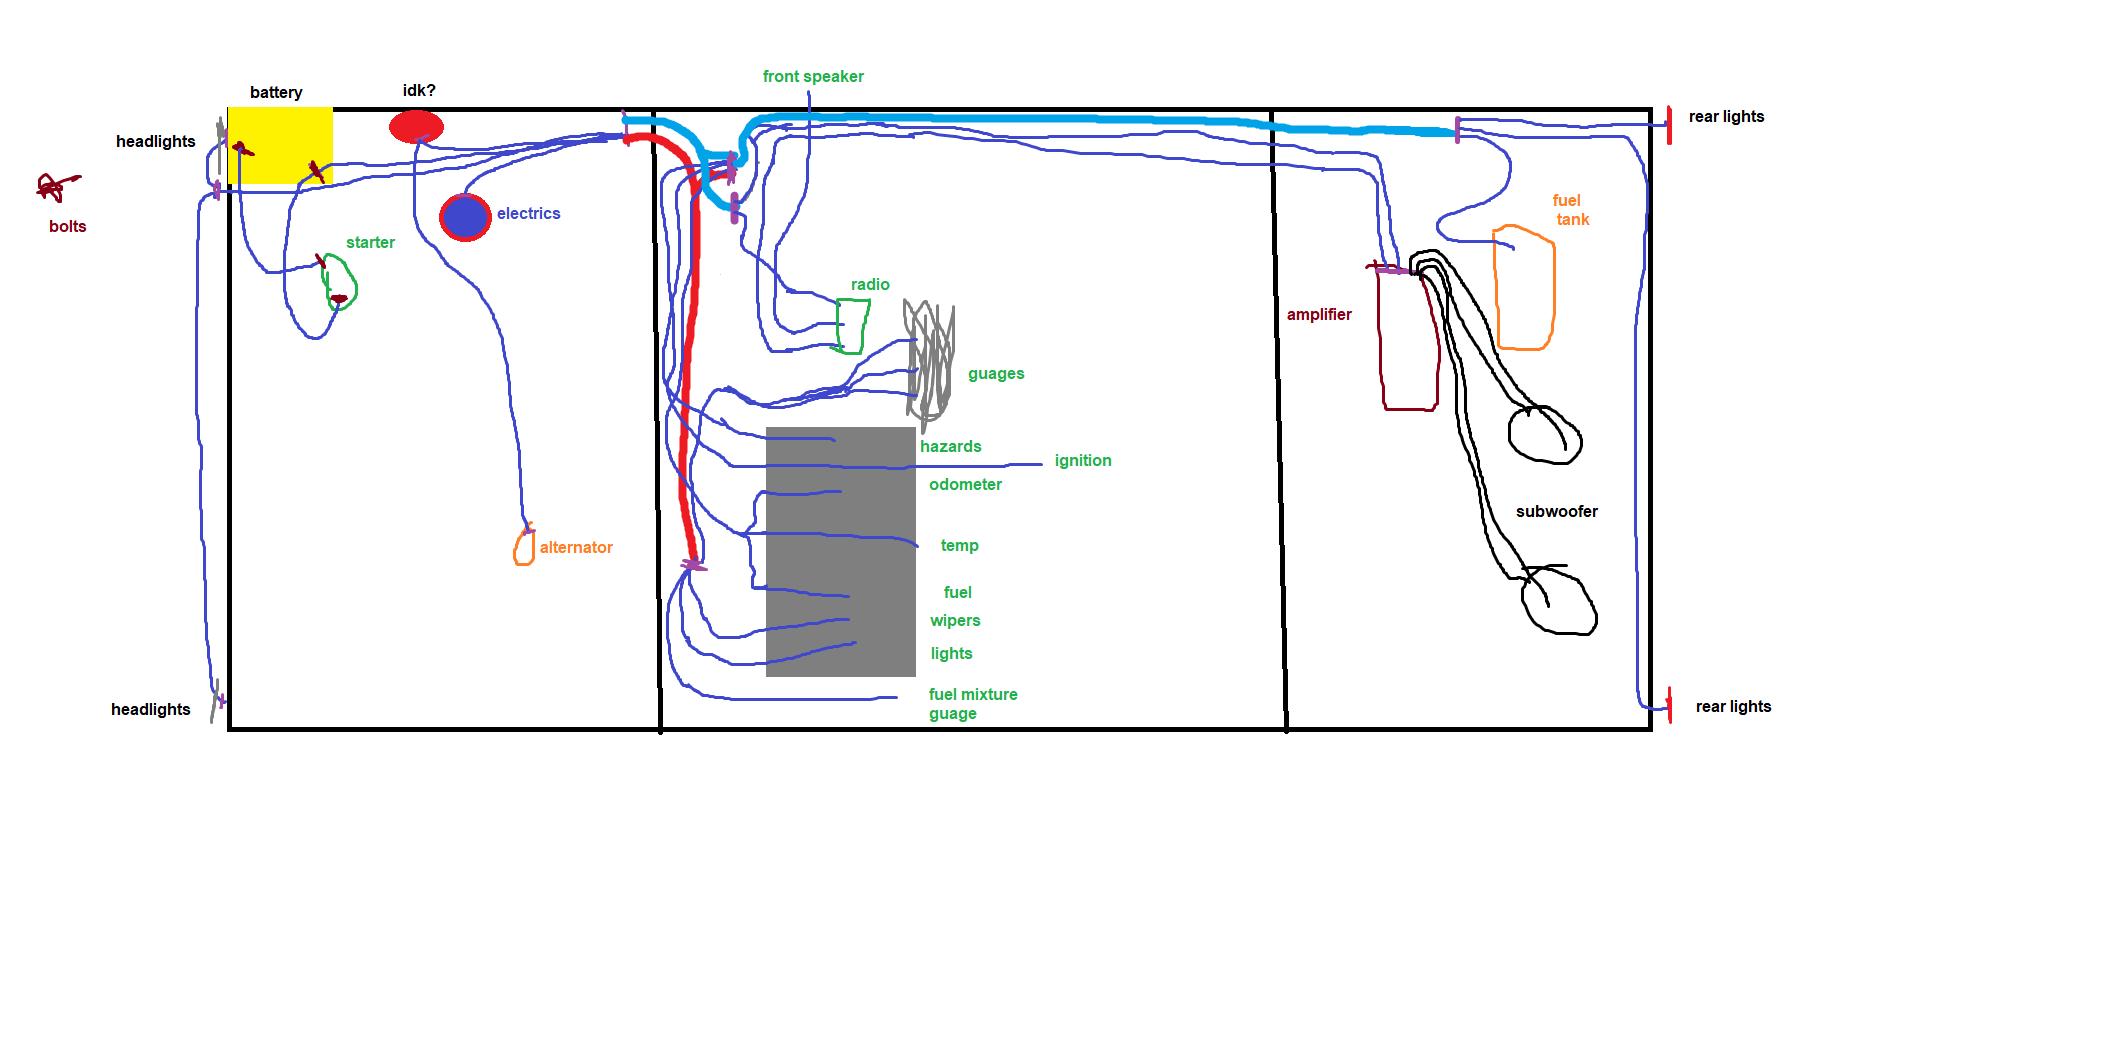 medium resolution of wiring diagram for my car wiring diagram go wiring diagram for my car steam community wire